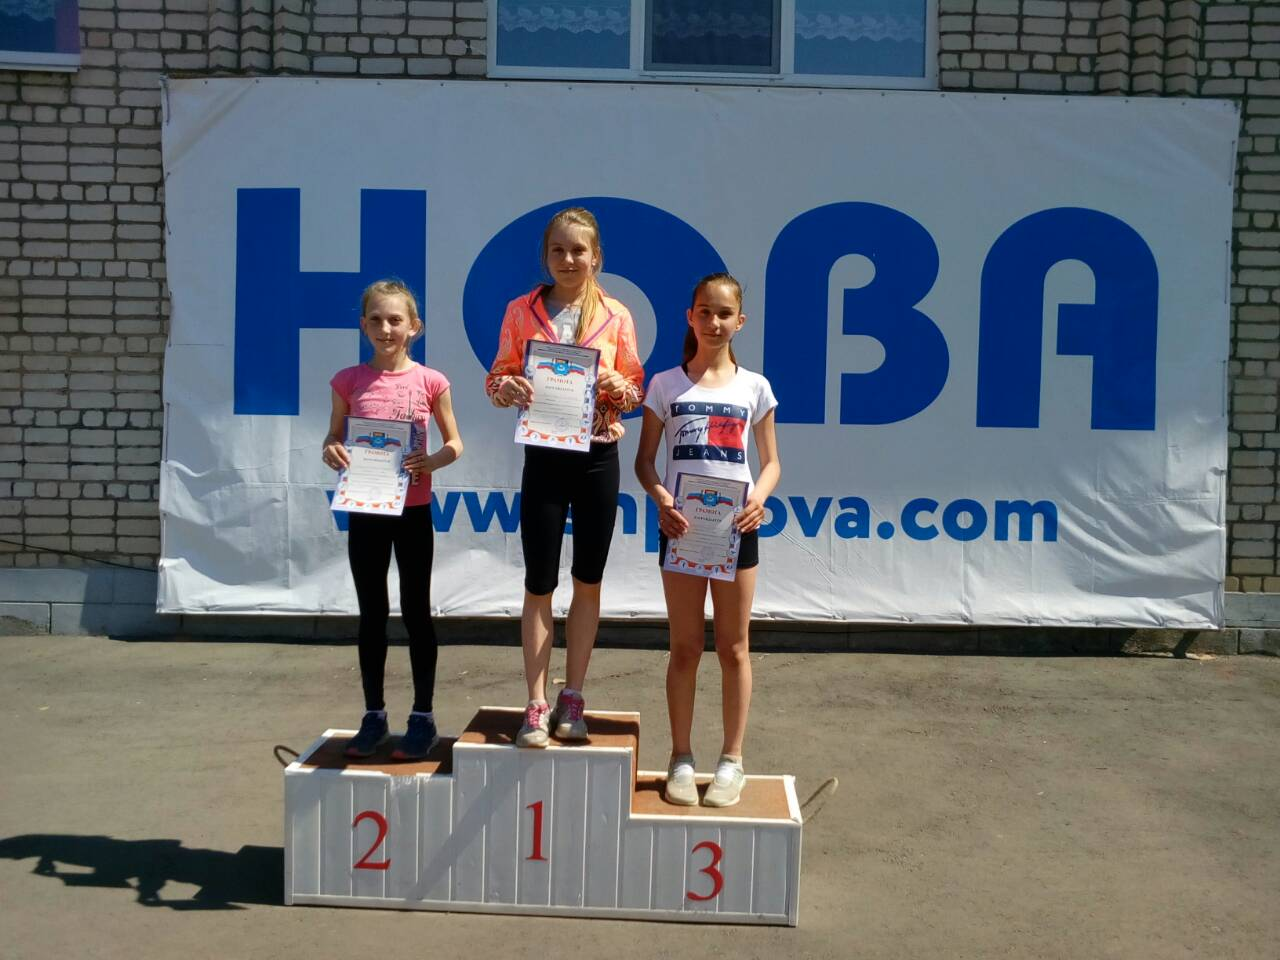 16 вольчан победили в Балаково!